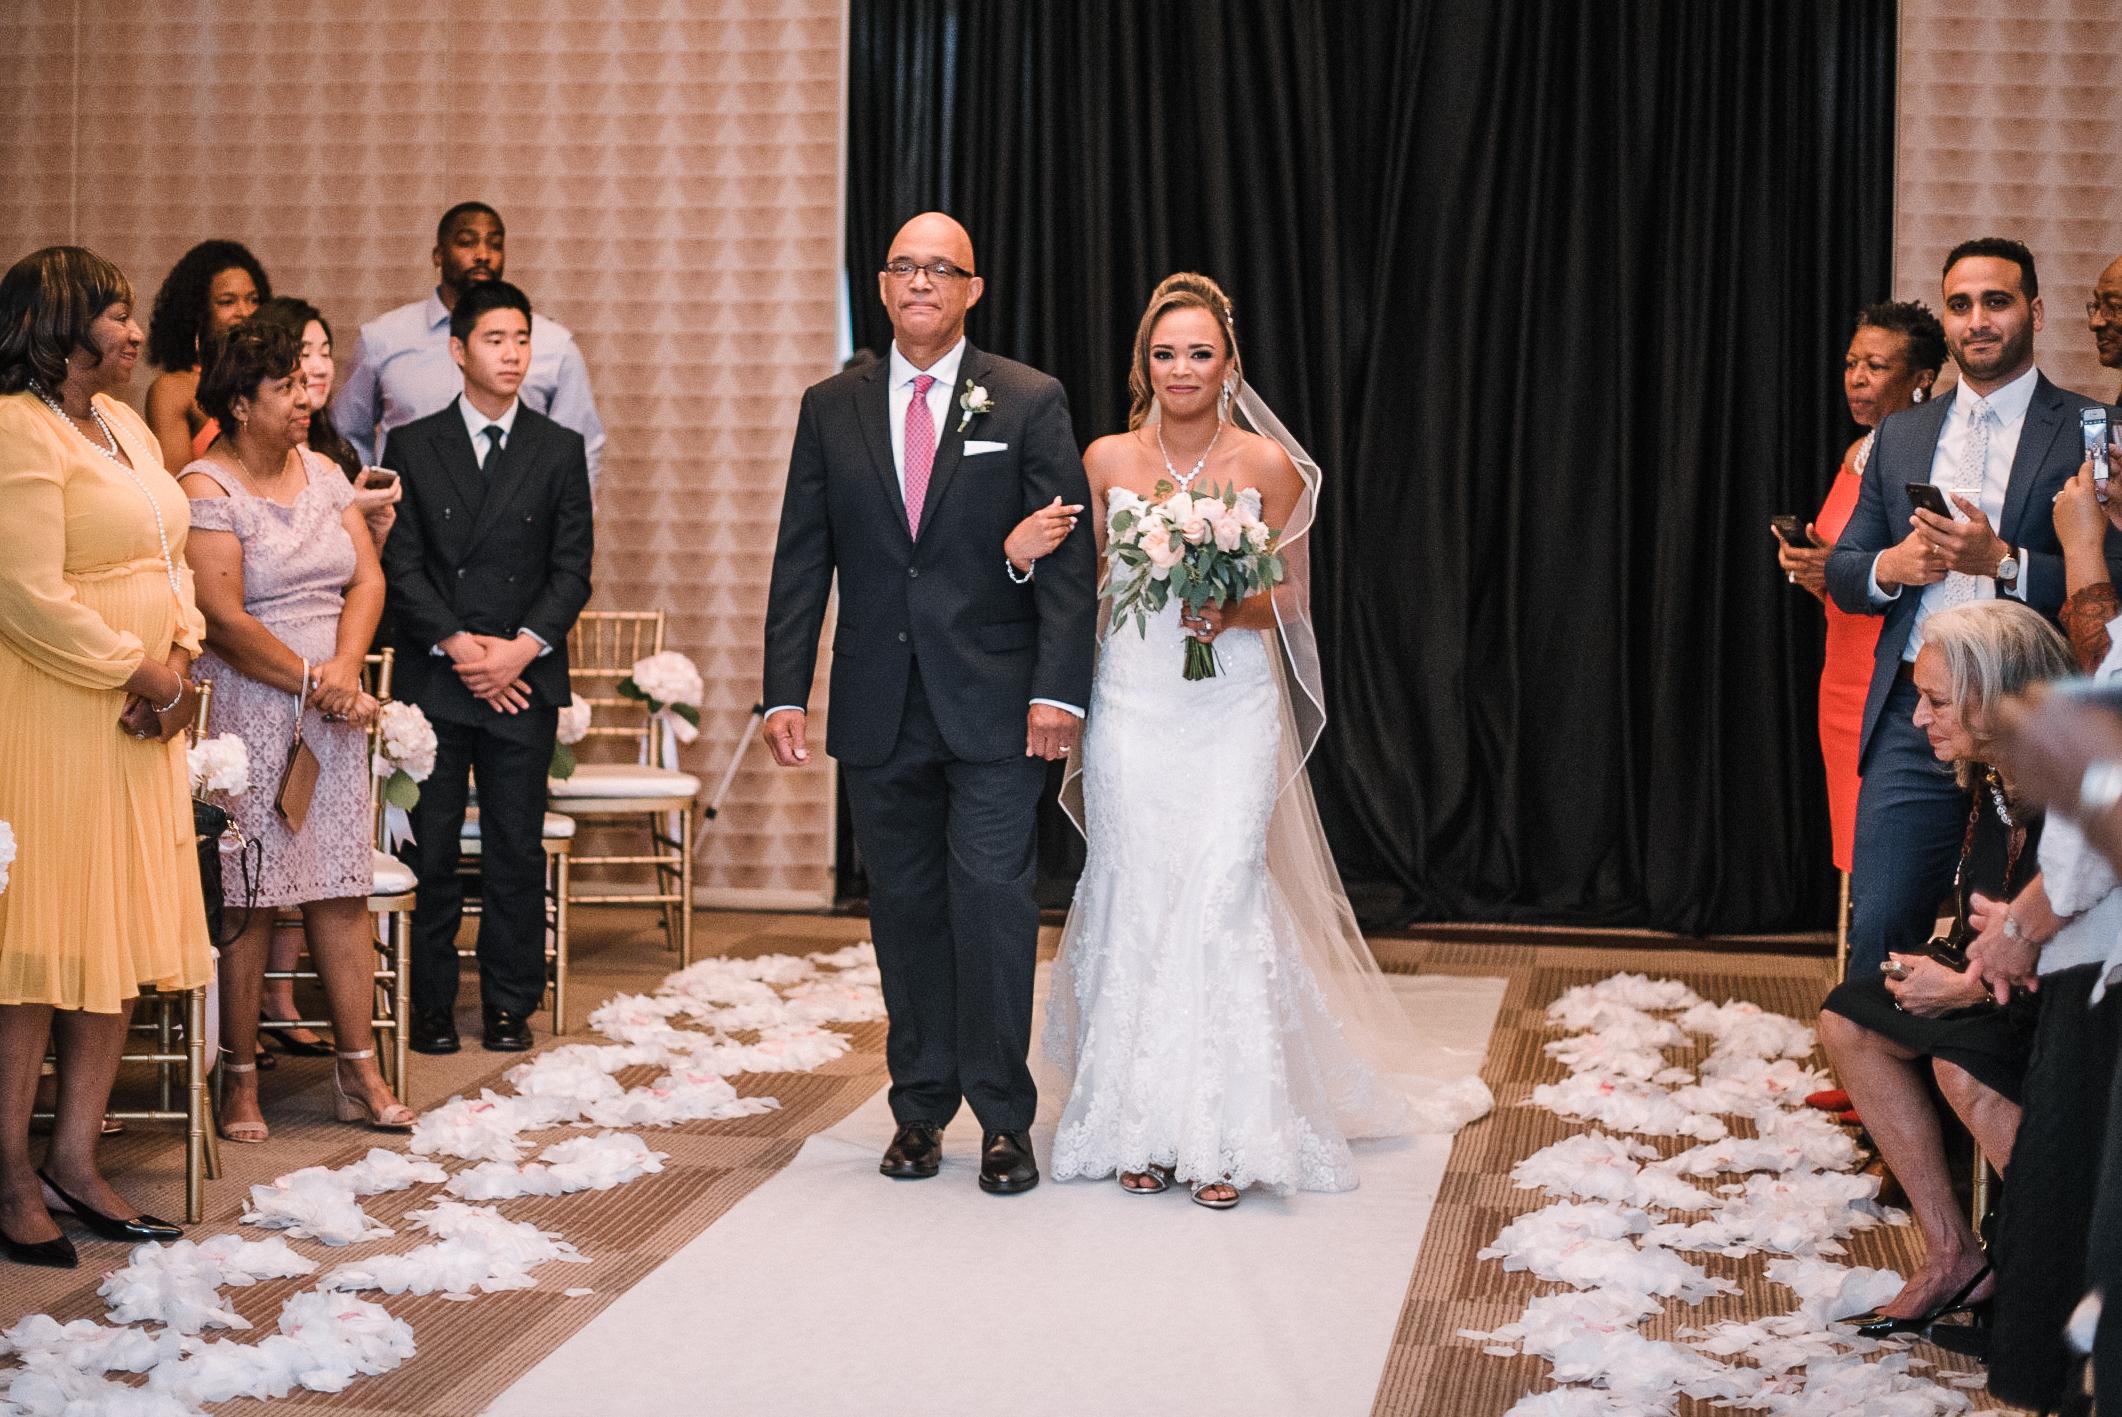 bride walking down the aisle at The Park Hyatt Hotel in Washington DC